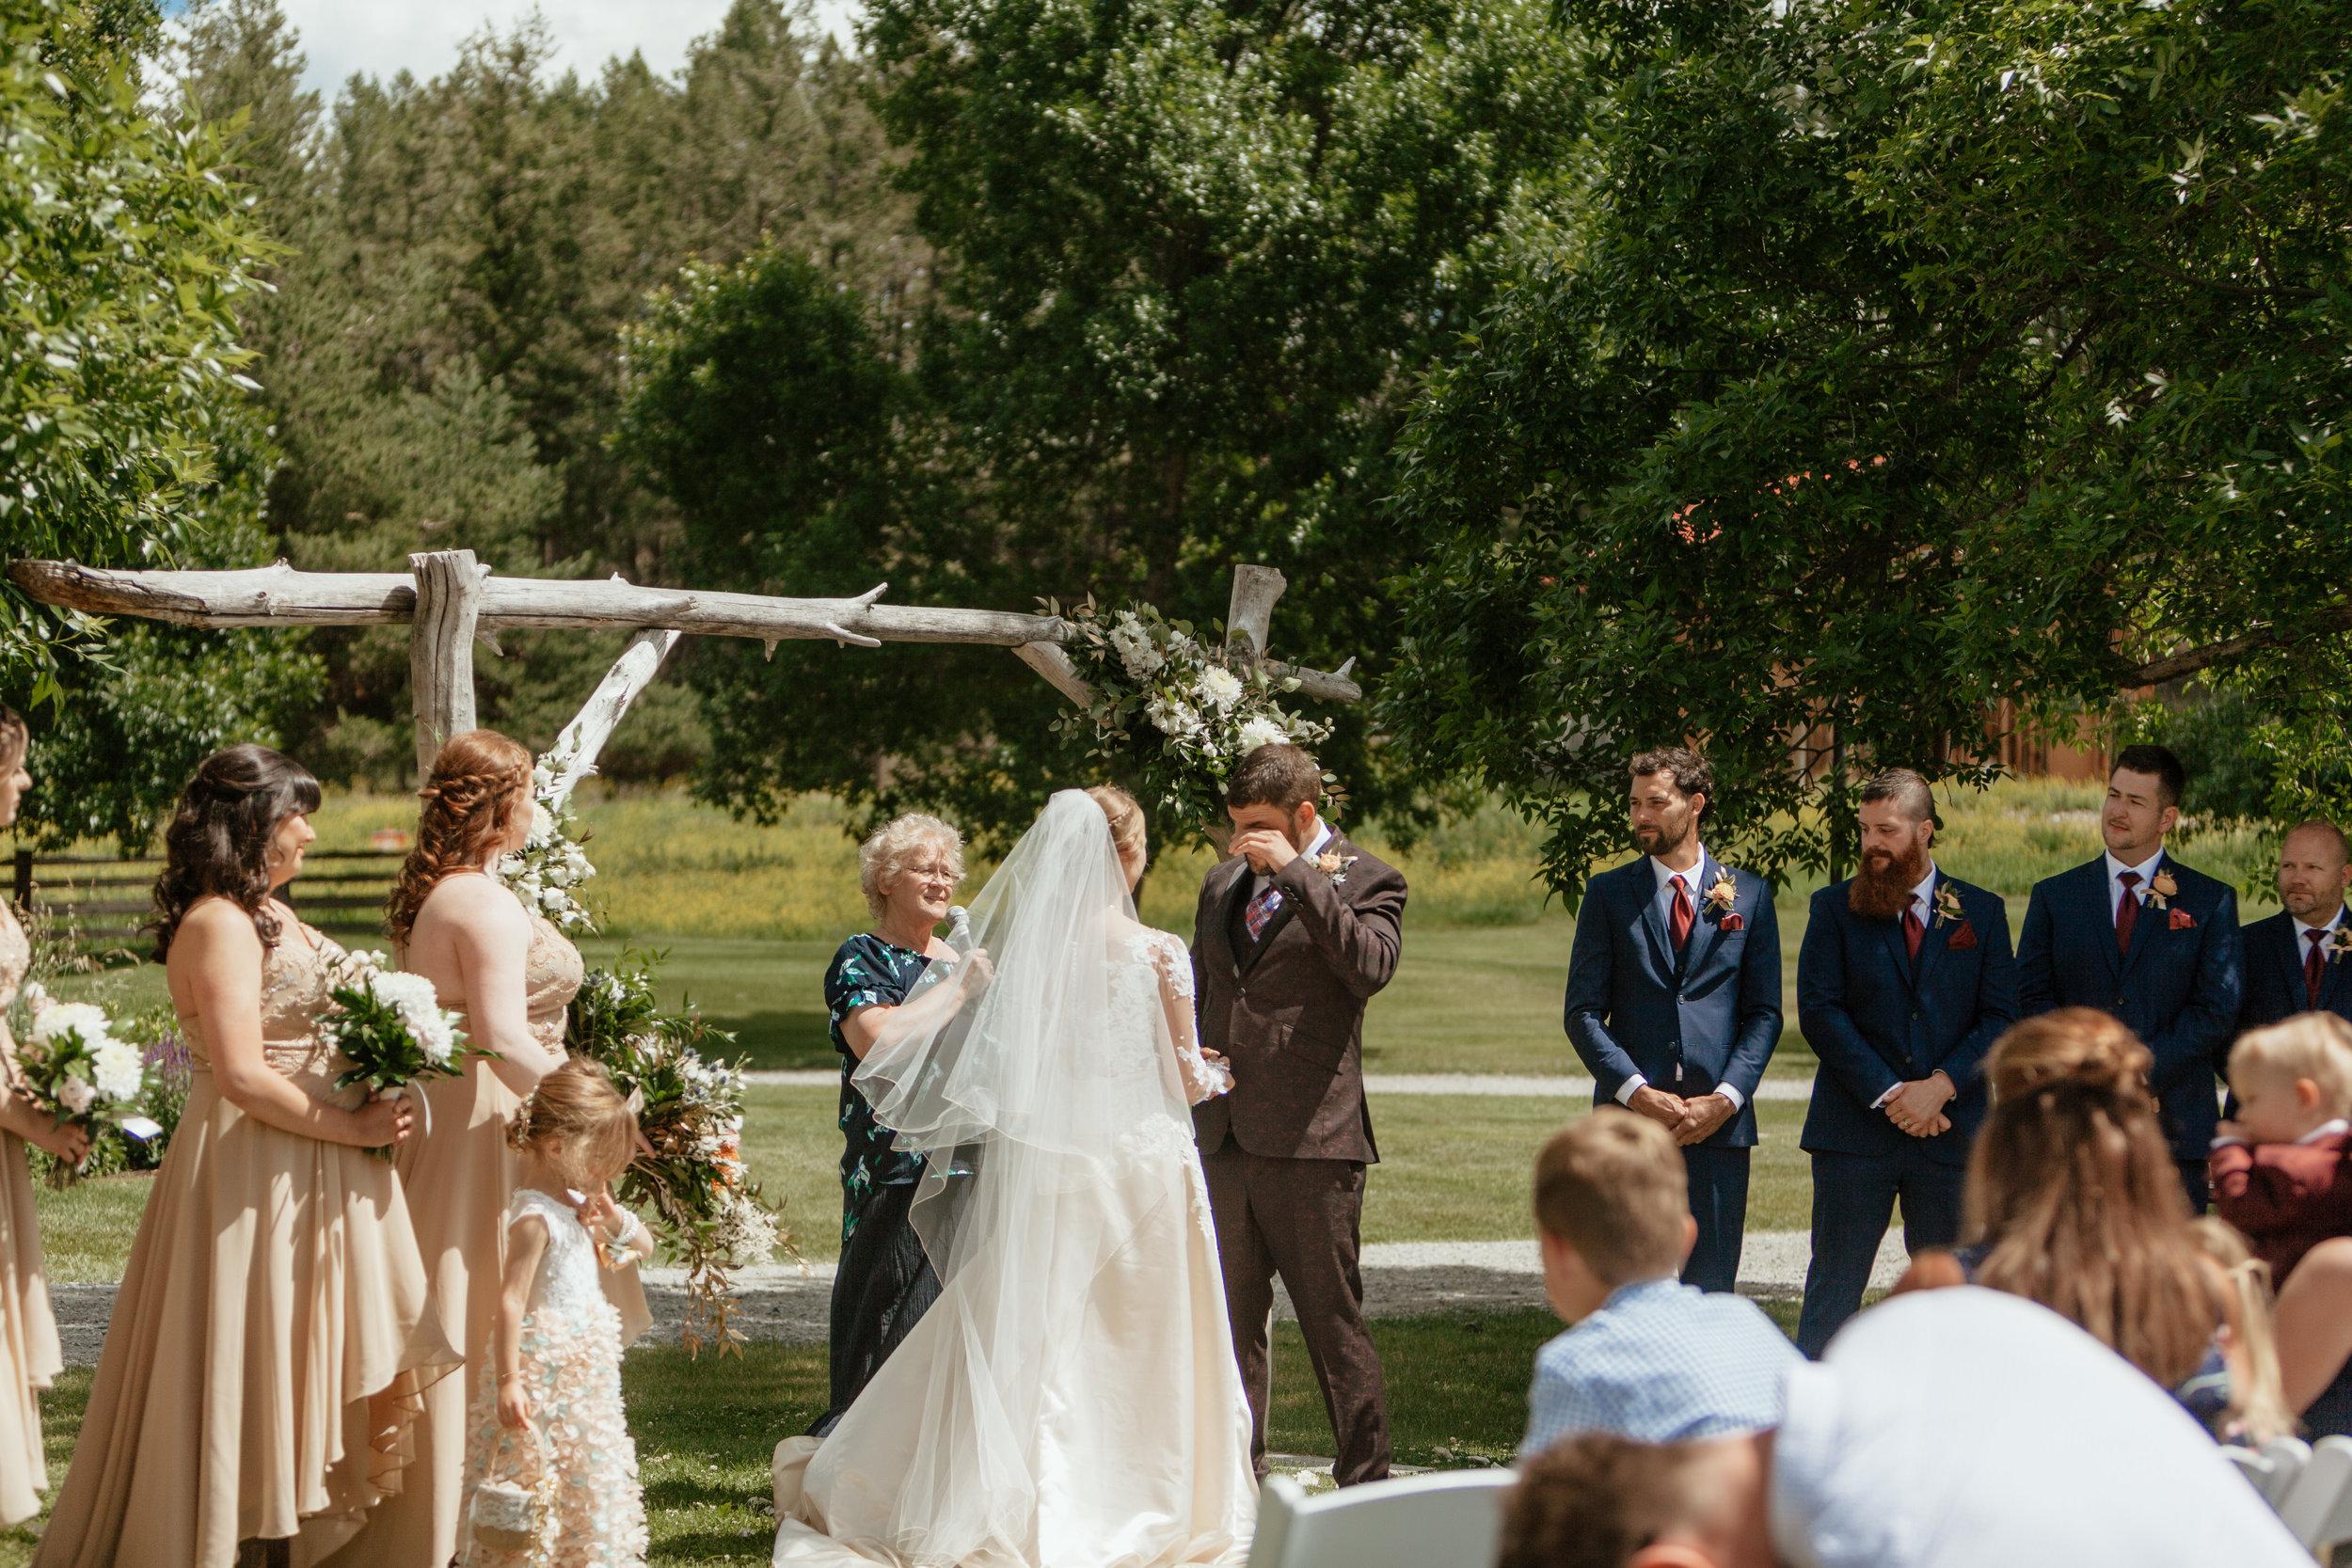 Dave + Amanda 2 - Ceremony-102.jpg